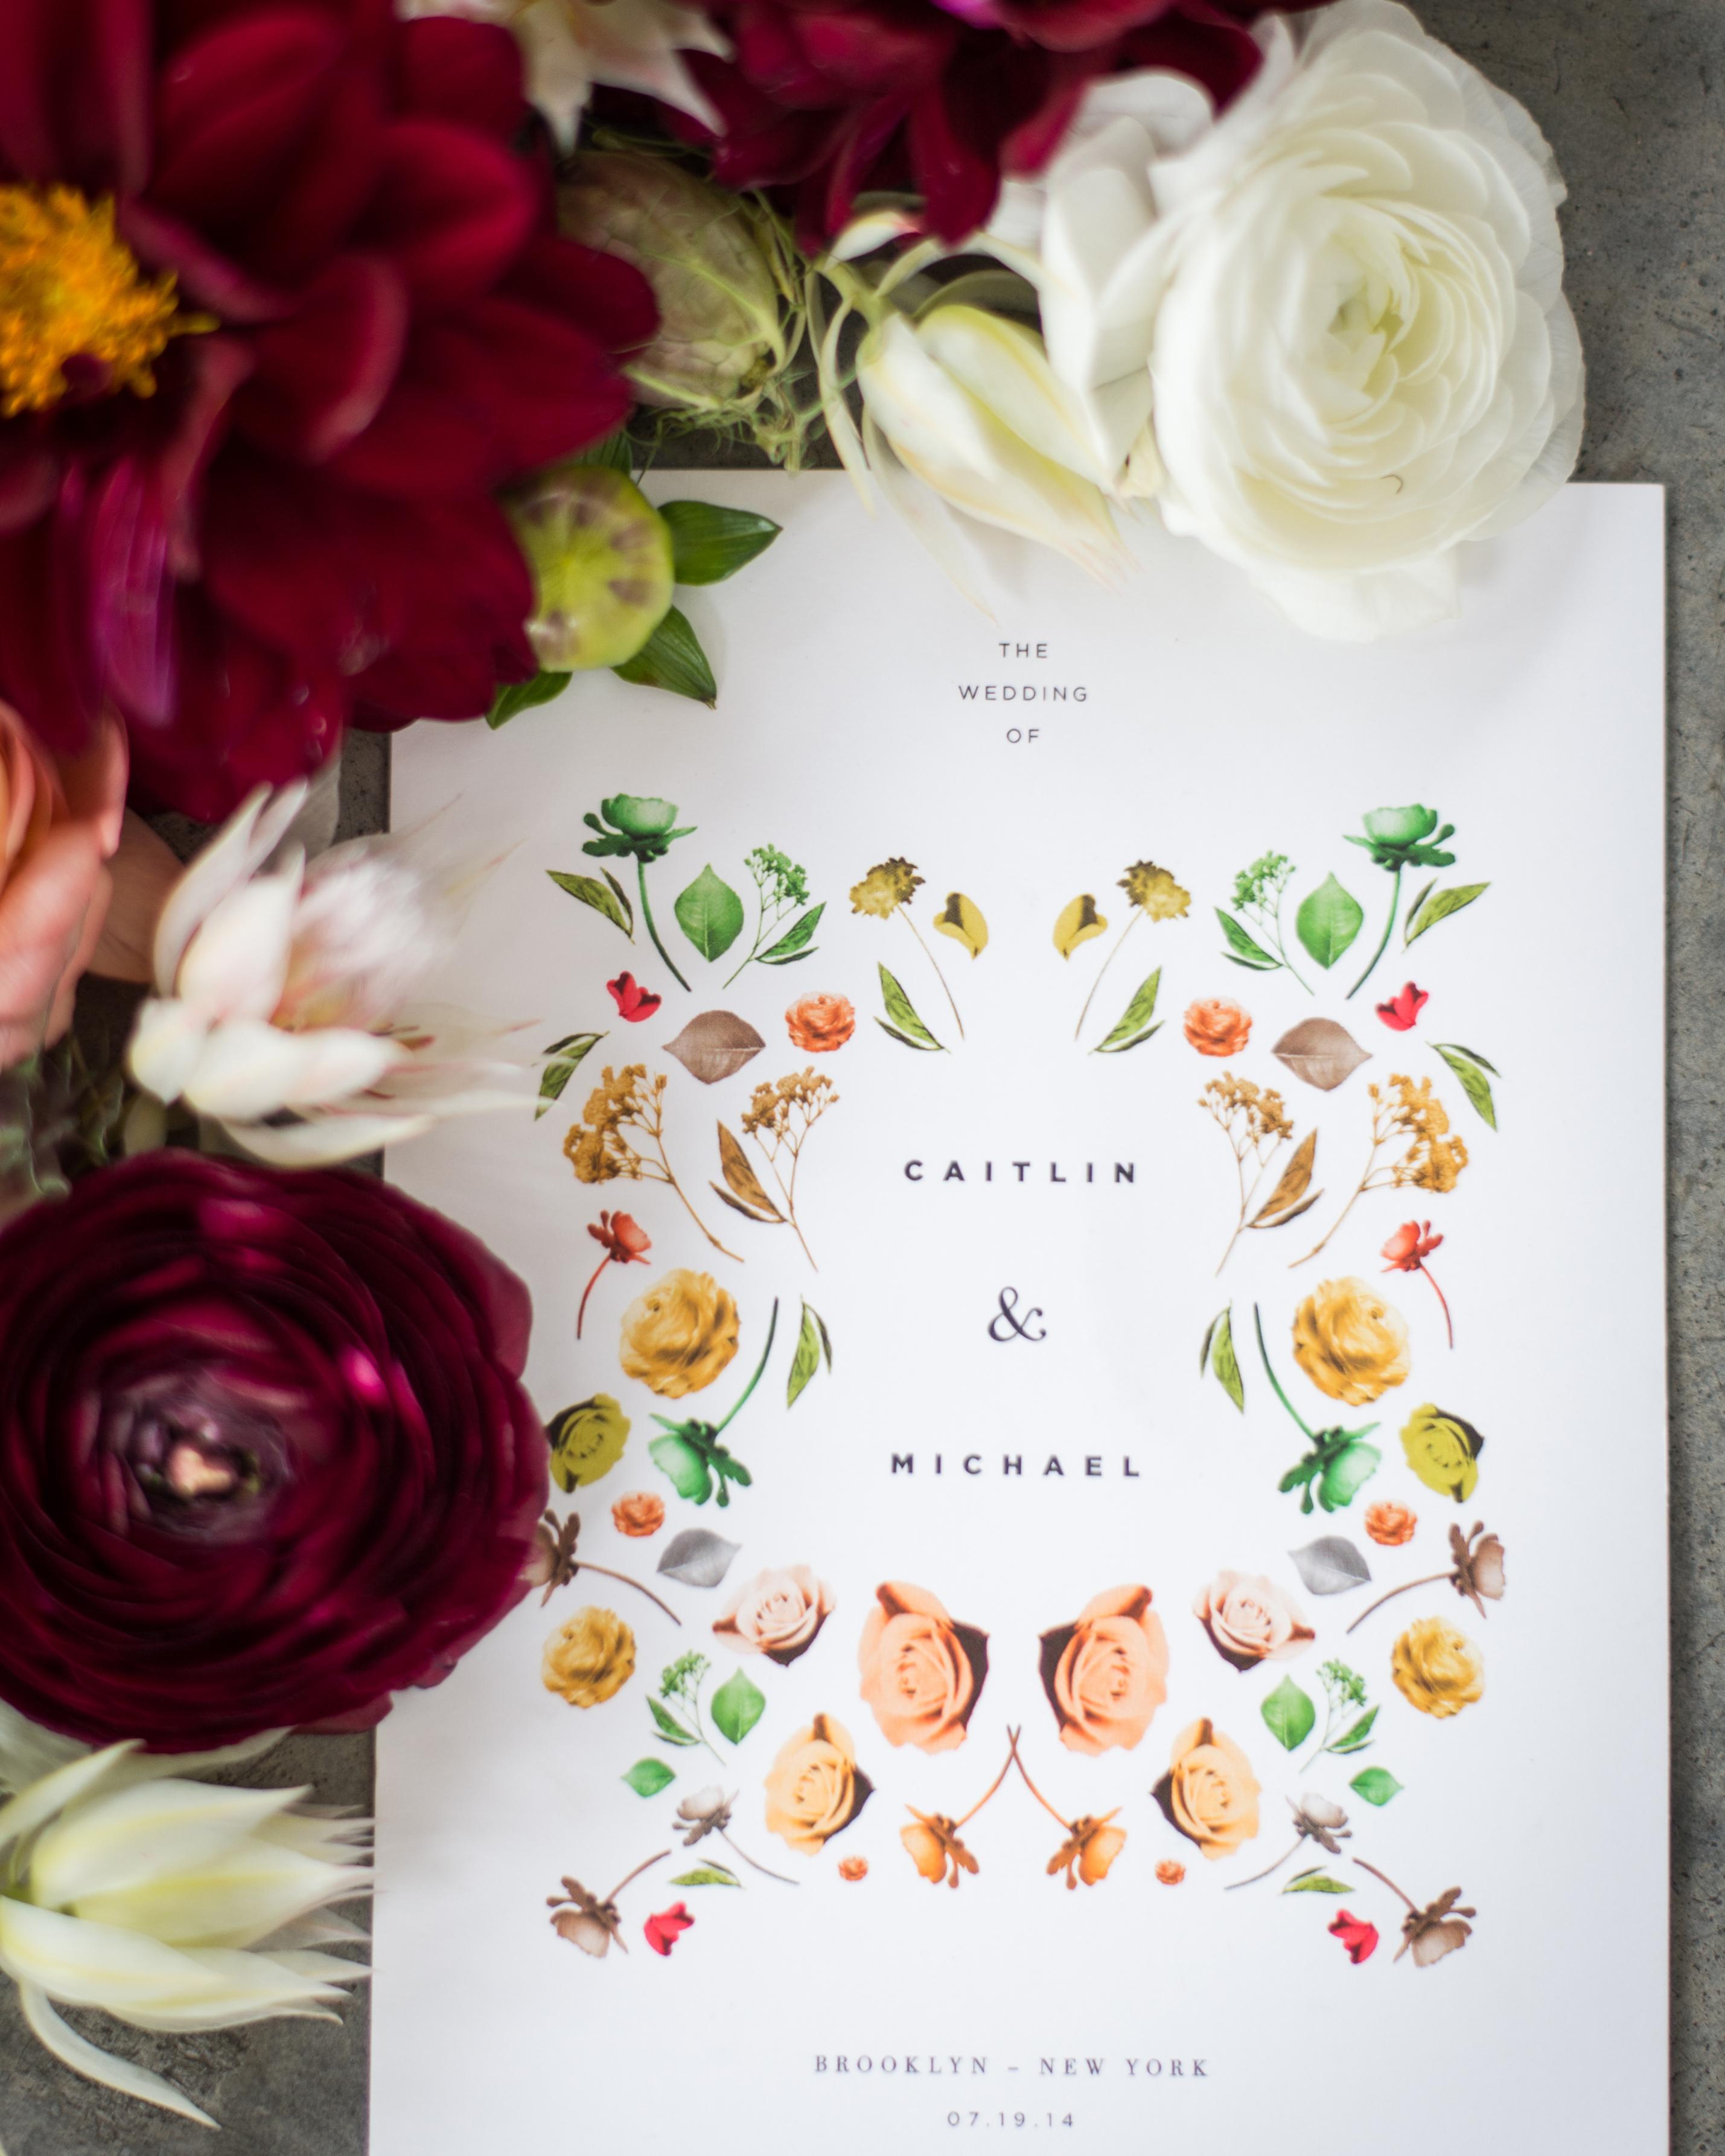 caitlin-michael-wedding-invite-666-s111835-0415.jpg